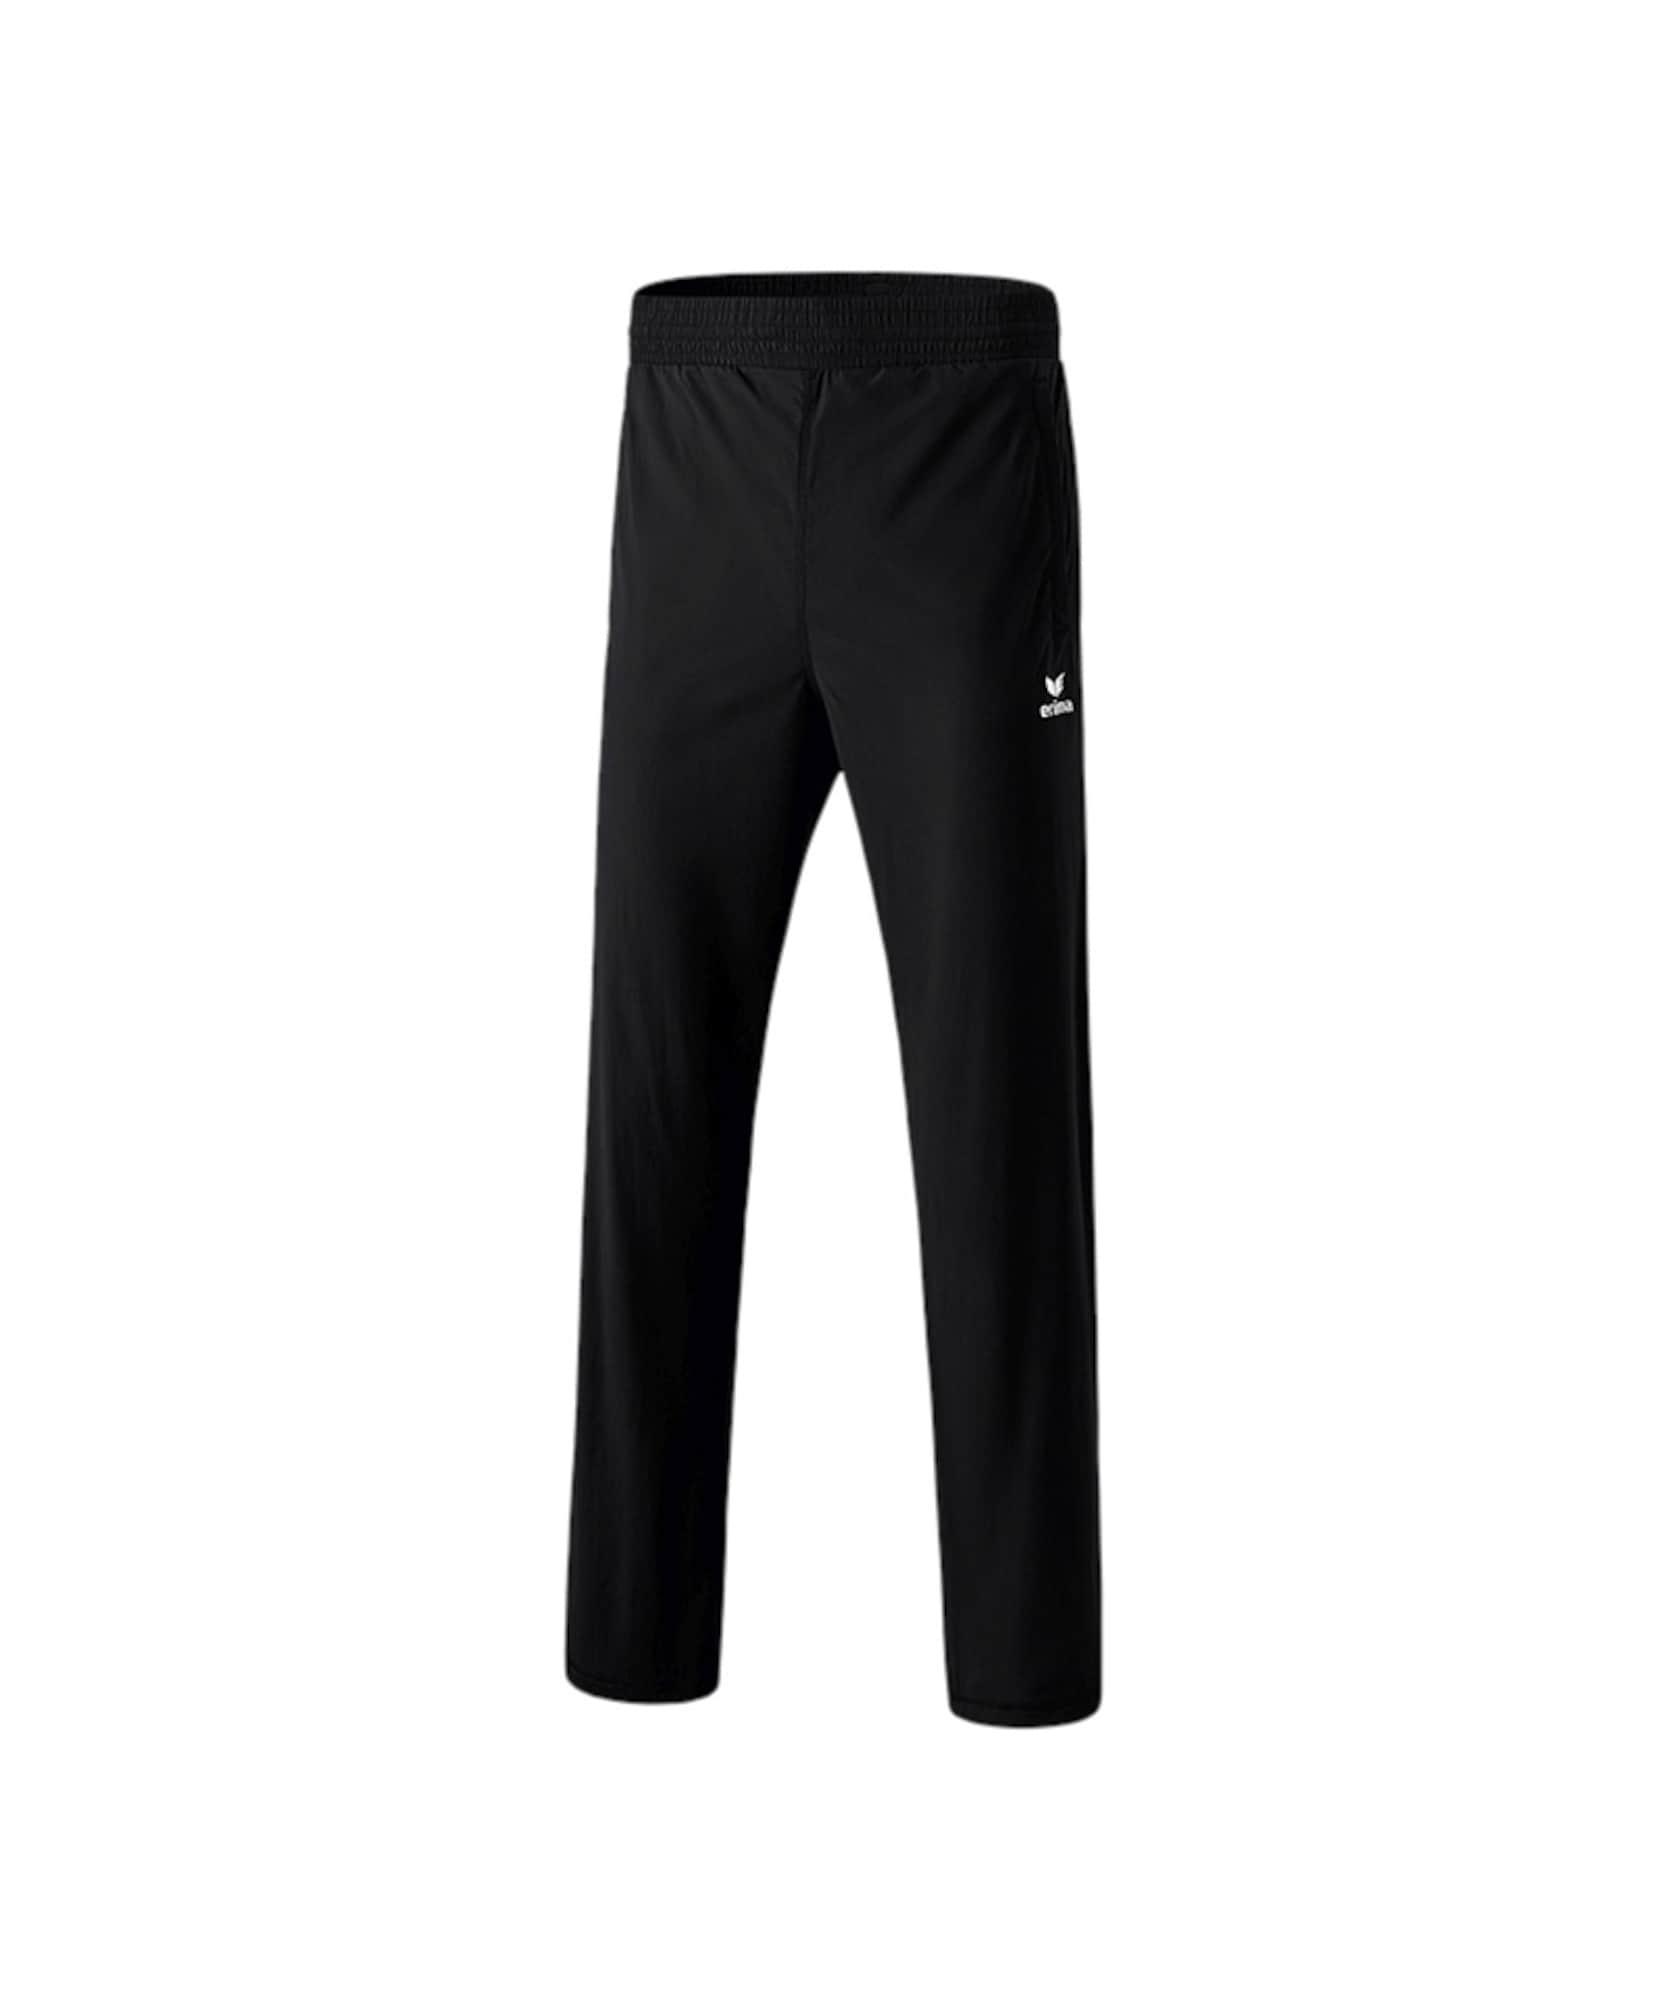 ERIMA Sporthose schwarz